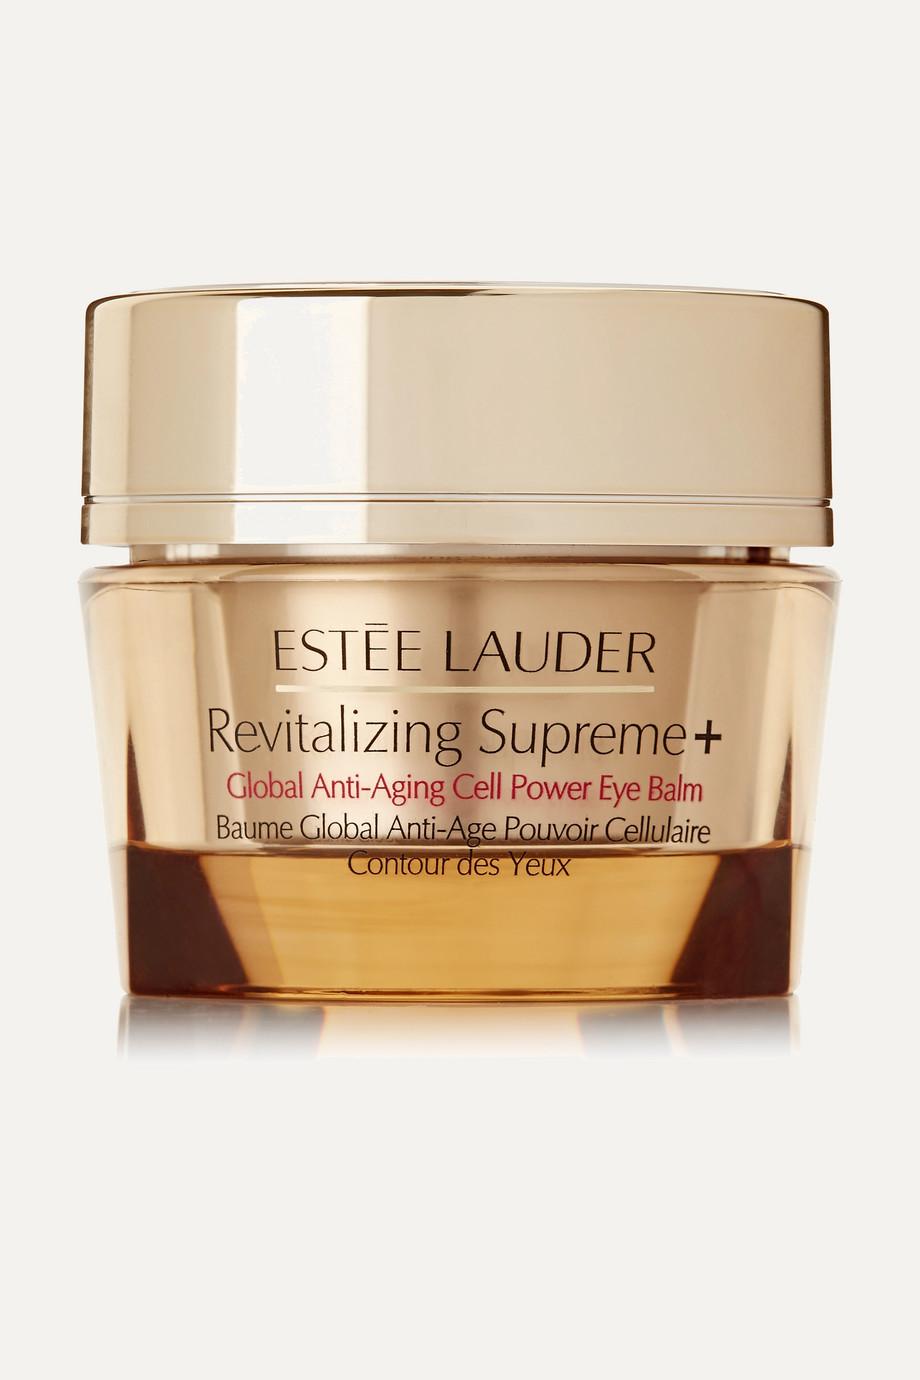 Estée Lauder Revitalizing Supreme + Global Anti-Aging Cell Power Eye Balm